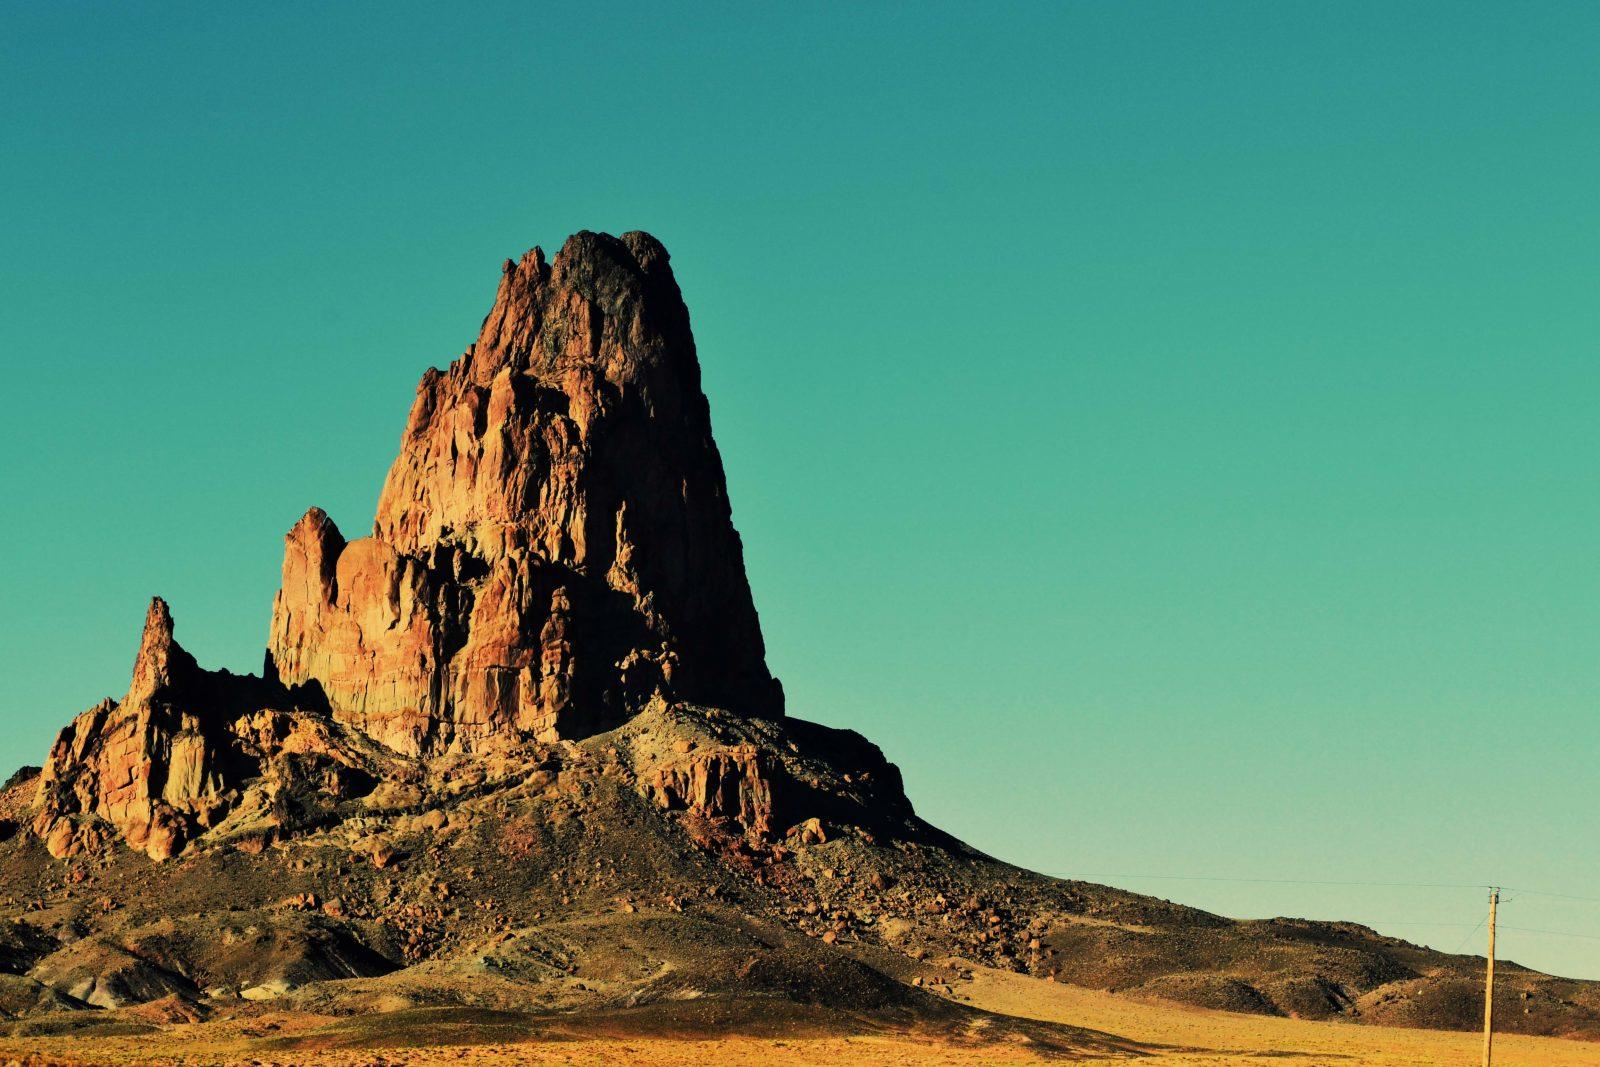 Desertic Landscape - Free Stock Photos   Life of Pix